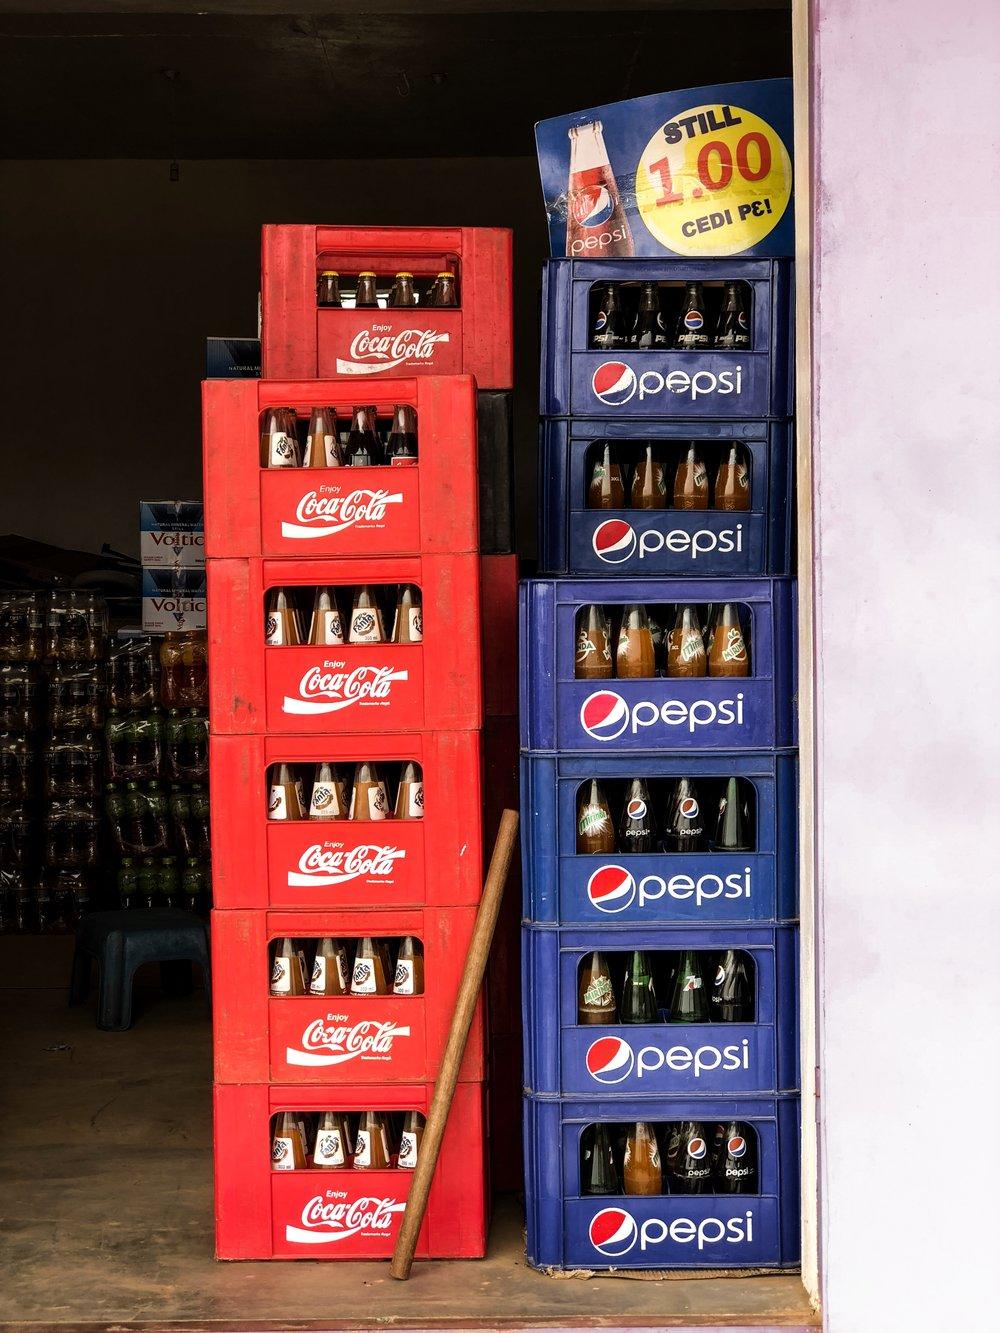 Ghana CocaCola